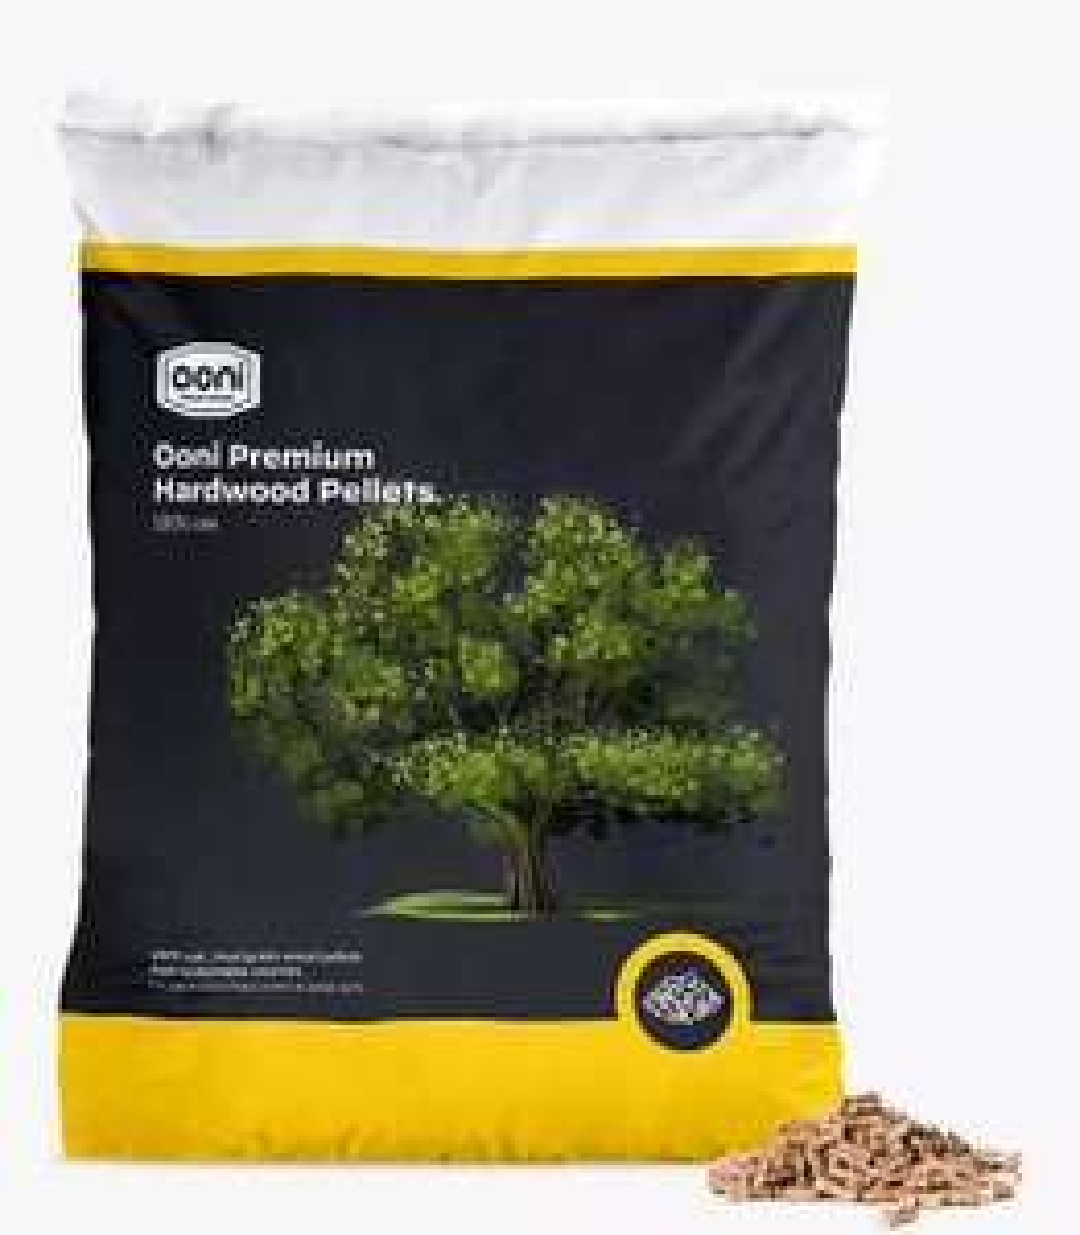 Ooni Pizza Oven Premium Hardwood Pellets (10kg) - £19.99 + £2 Click & Collect at John Lewis & Partners